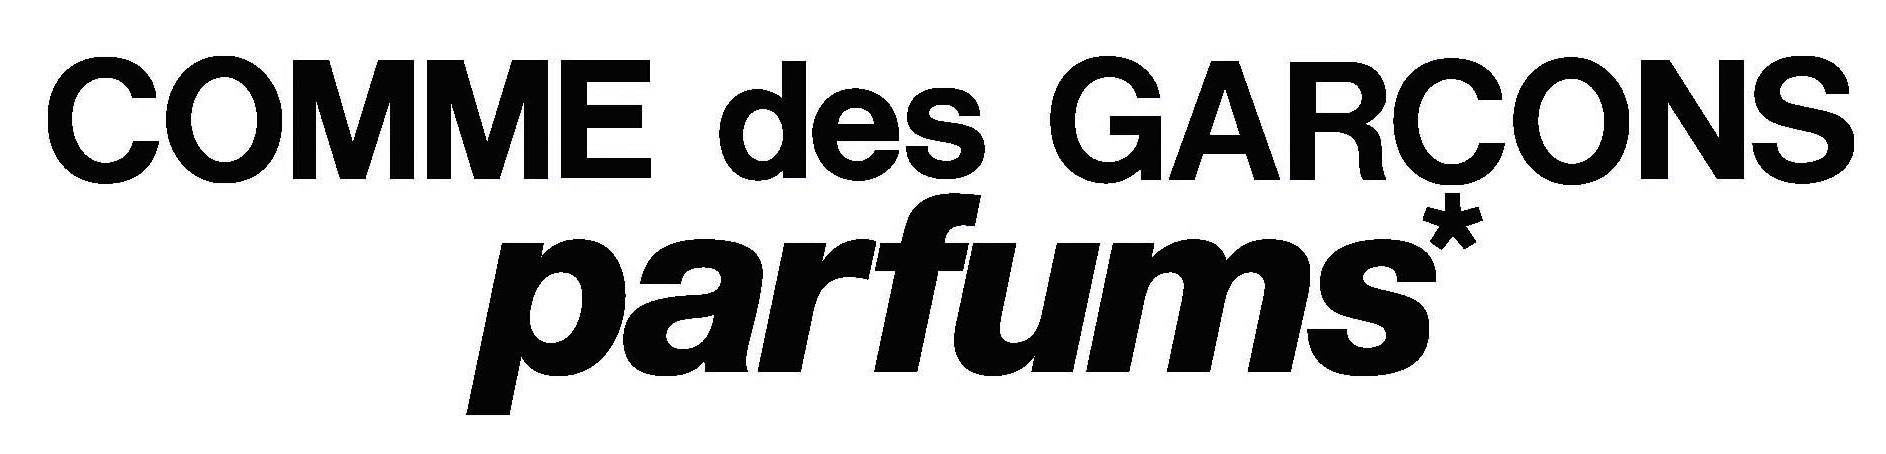 CDG parfums logo (JPG).jpg